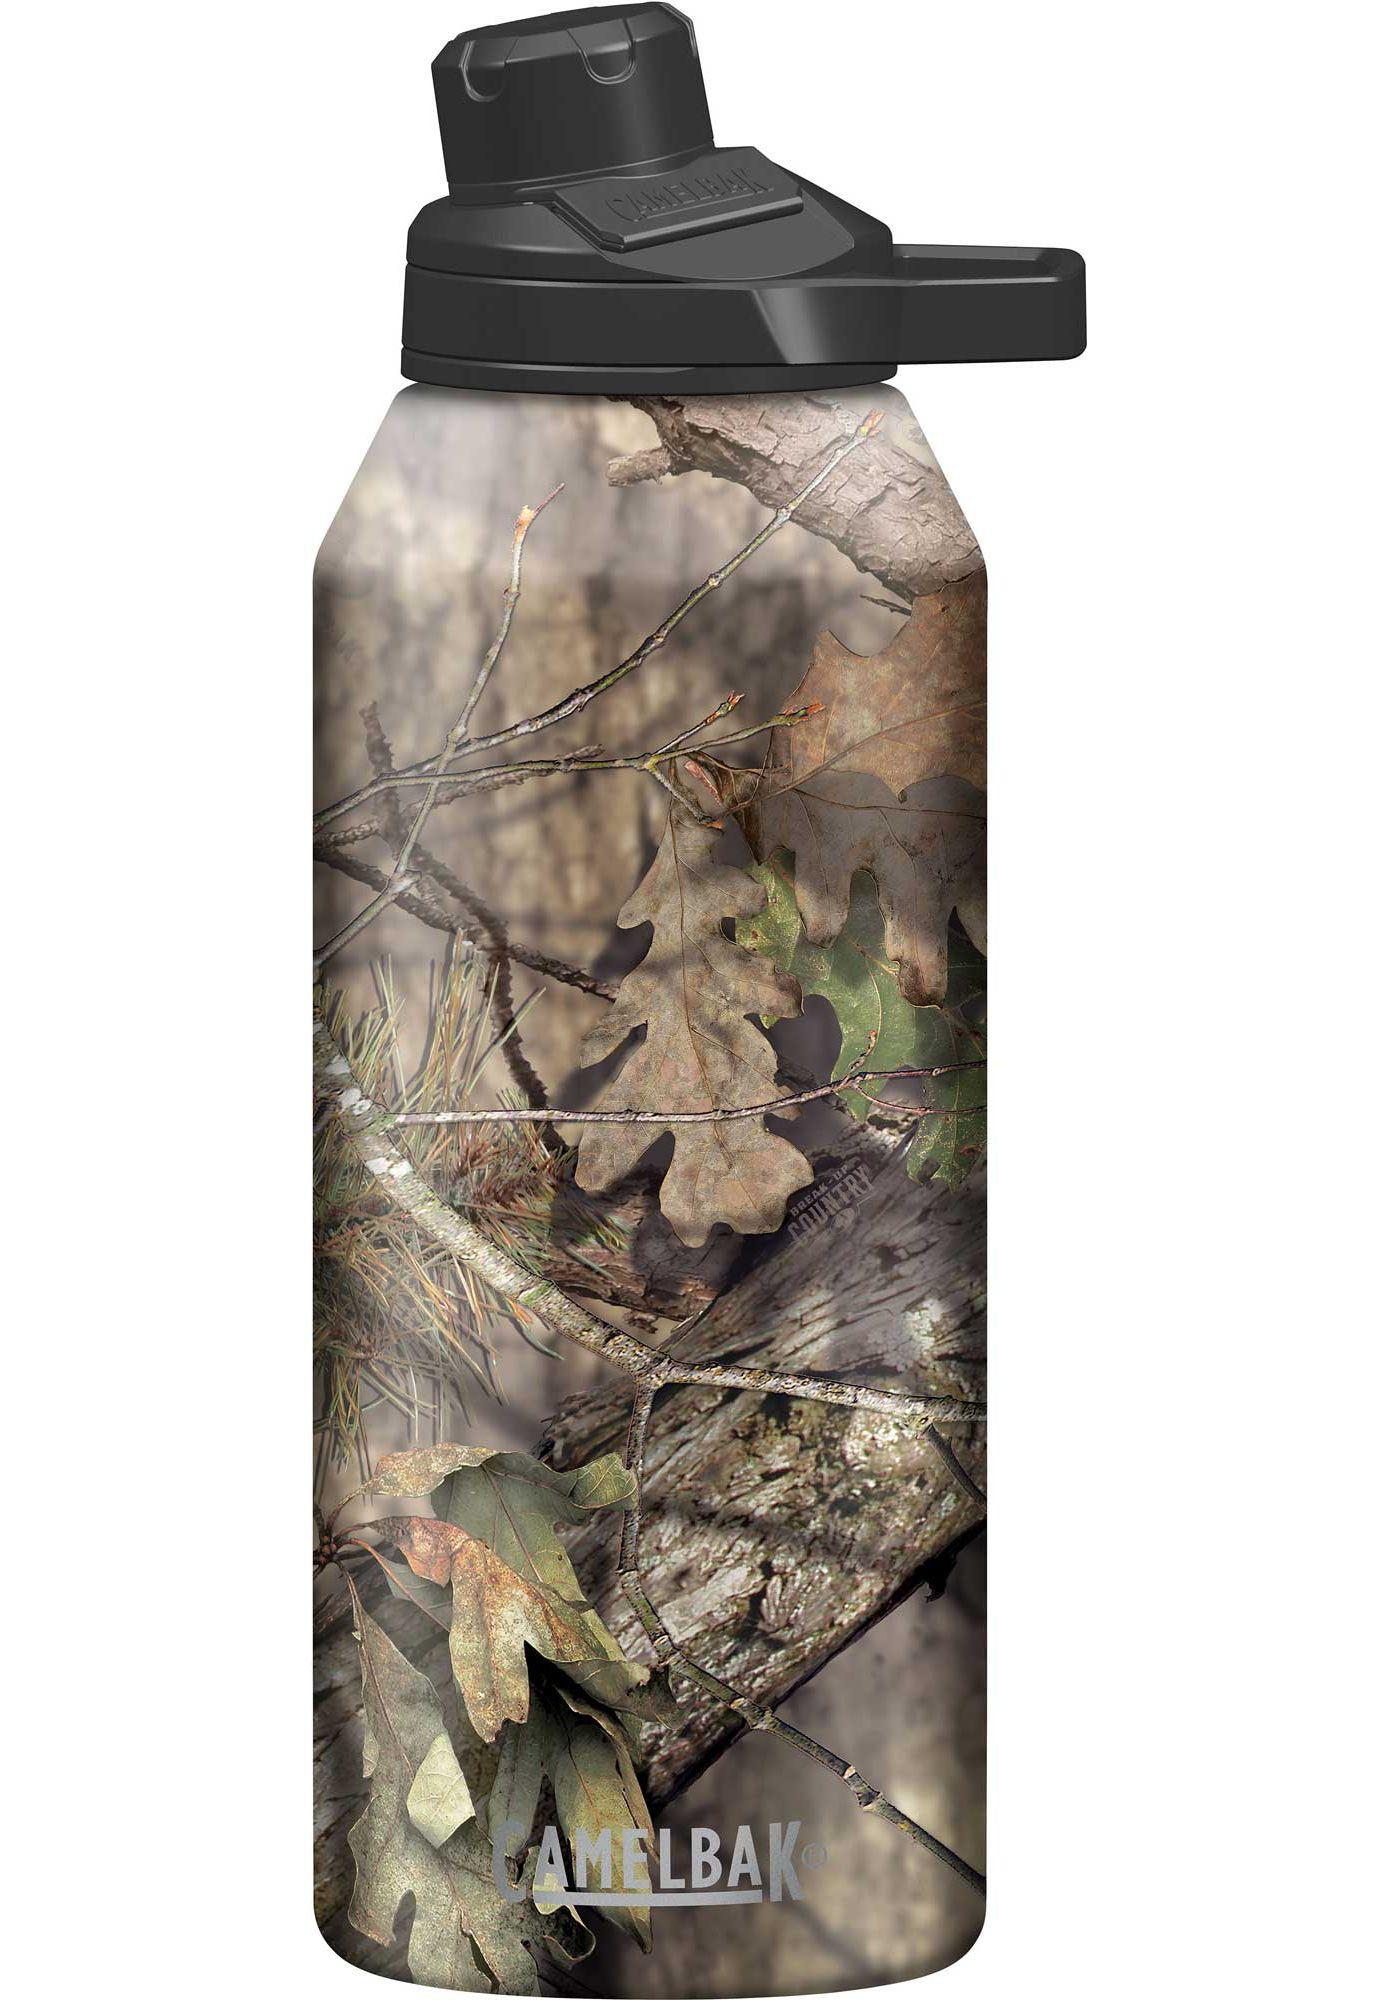 Camelbak Chute Mag Vacuum 40 oz. Camo Bottle